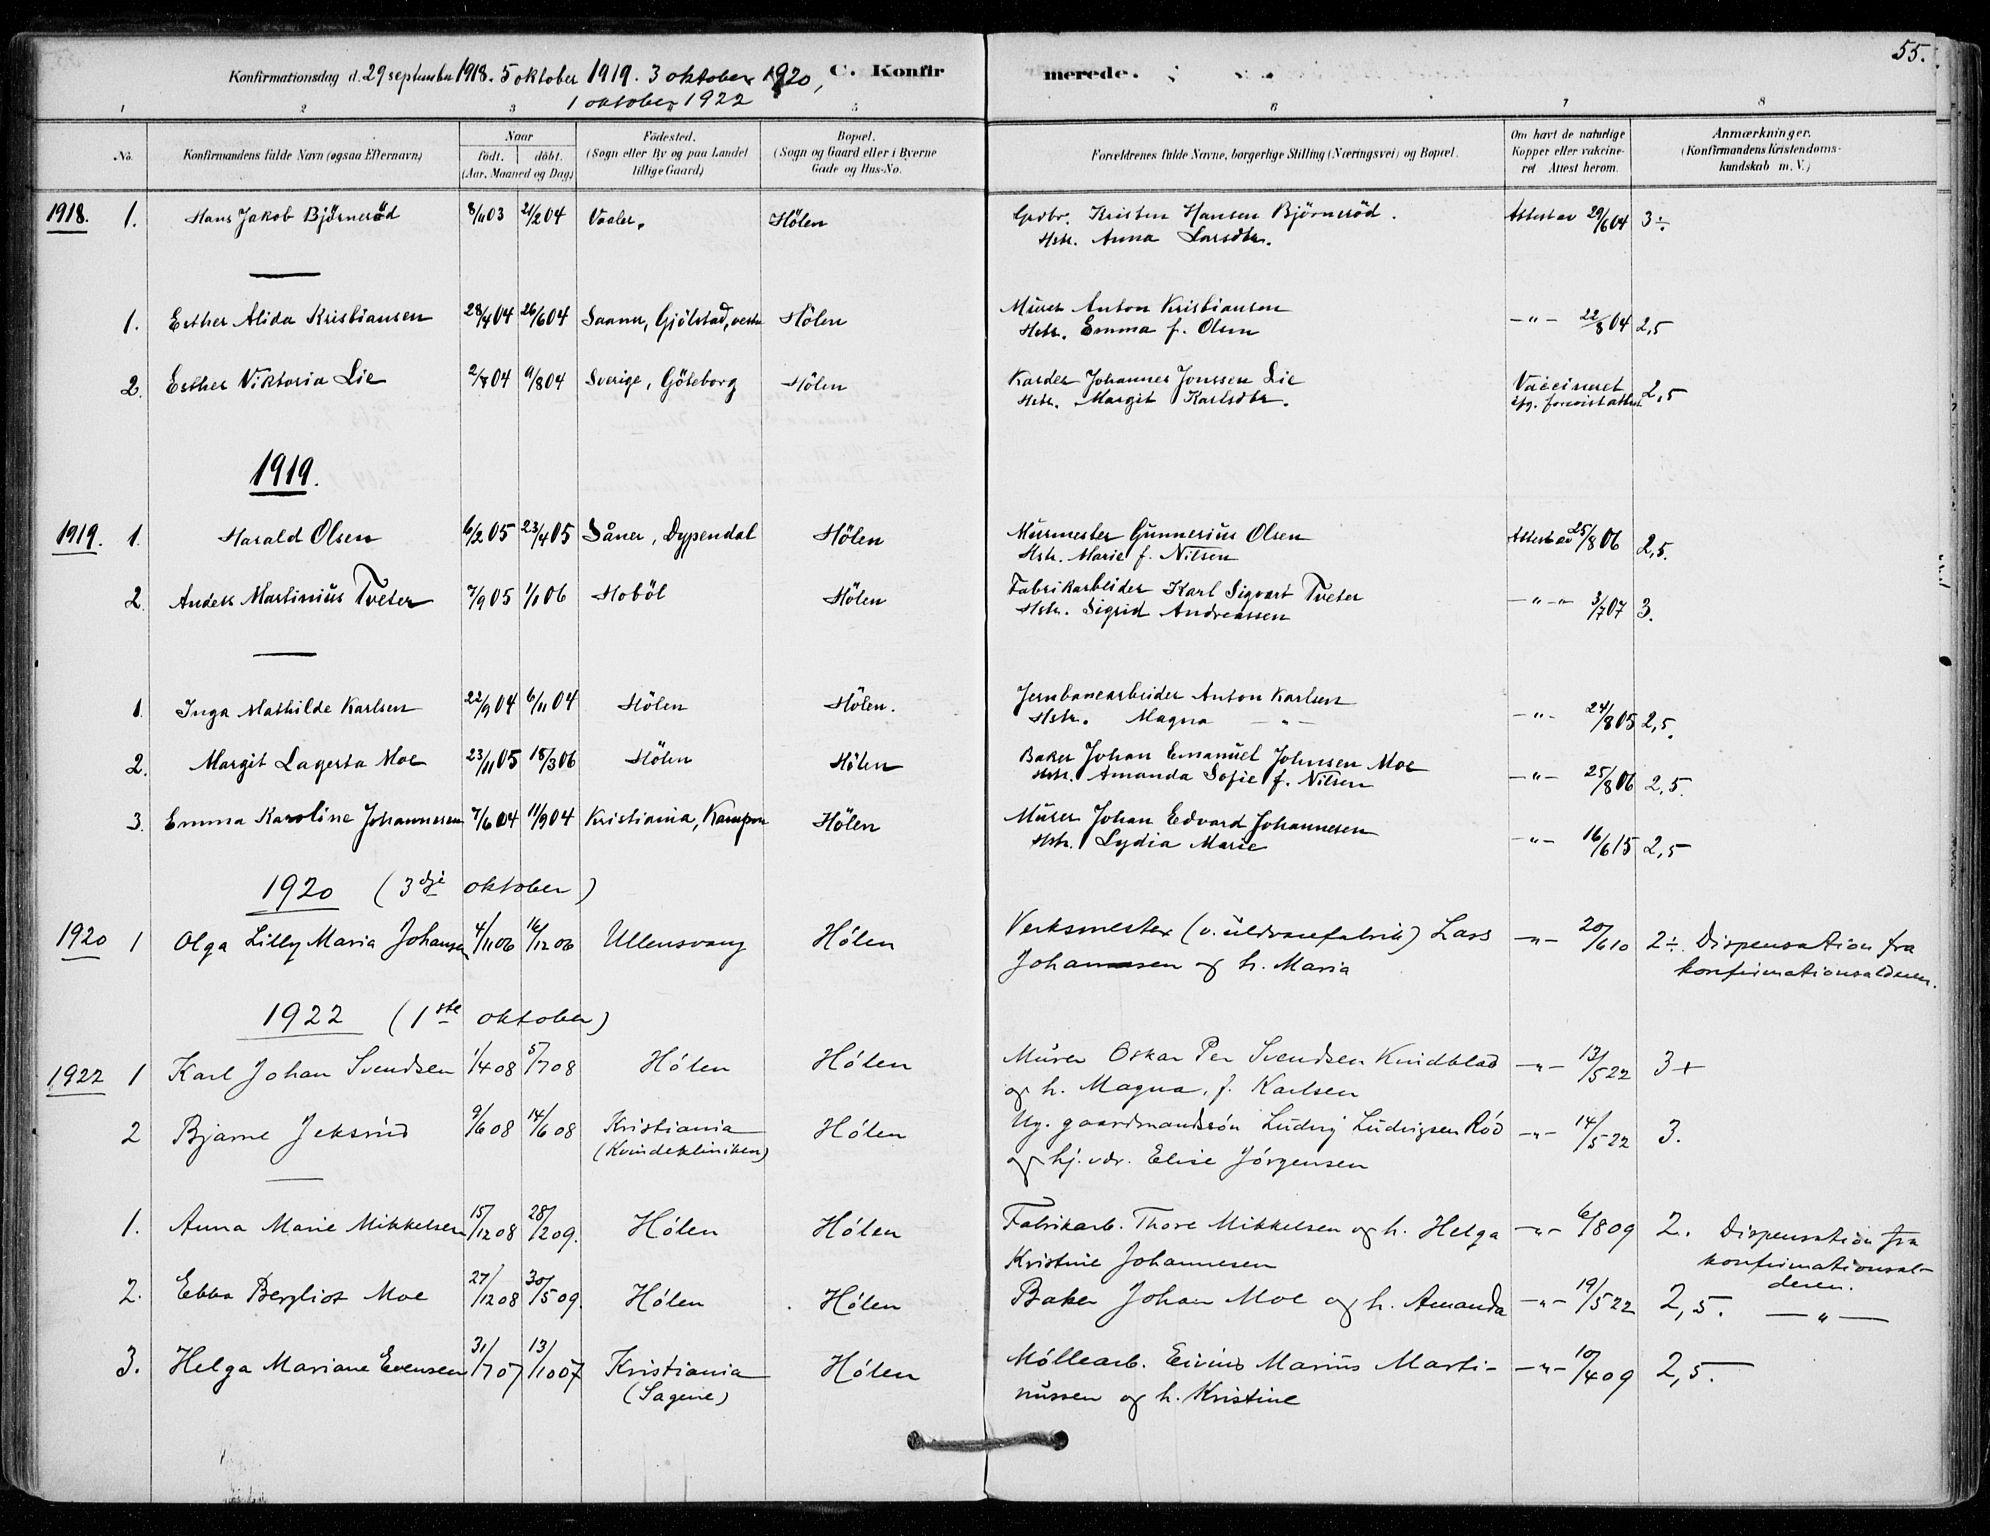 SAO, Vestby prestekontor Kirkebøker, F/Fe/L0001: Ministerialbok nr. V 1, 1878-1931, s. 55